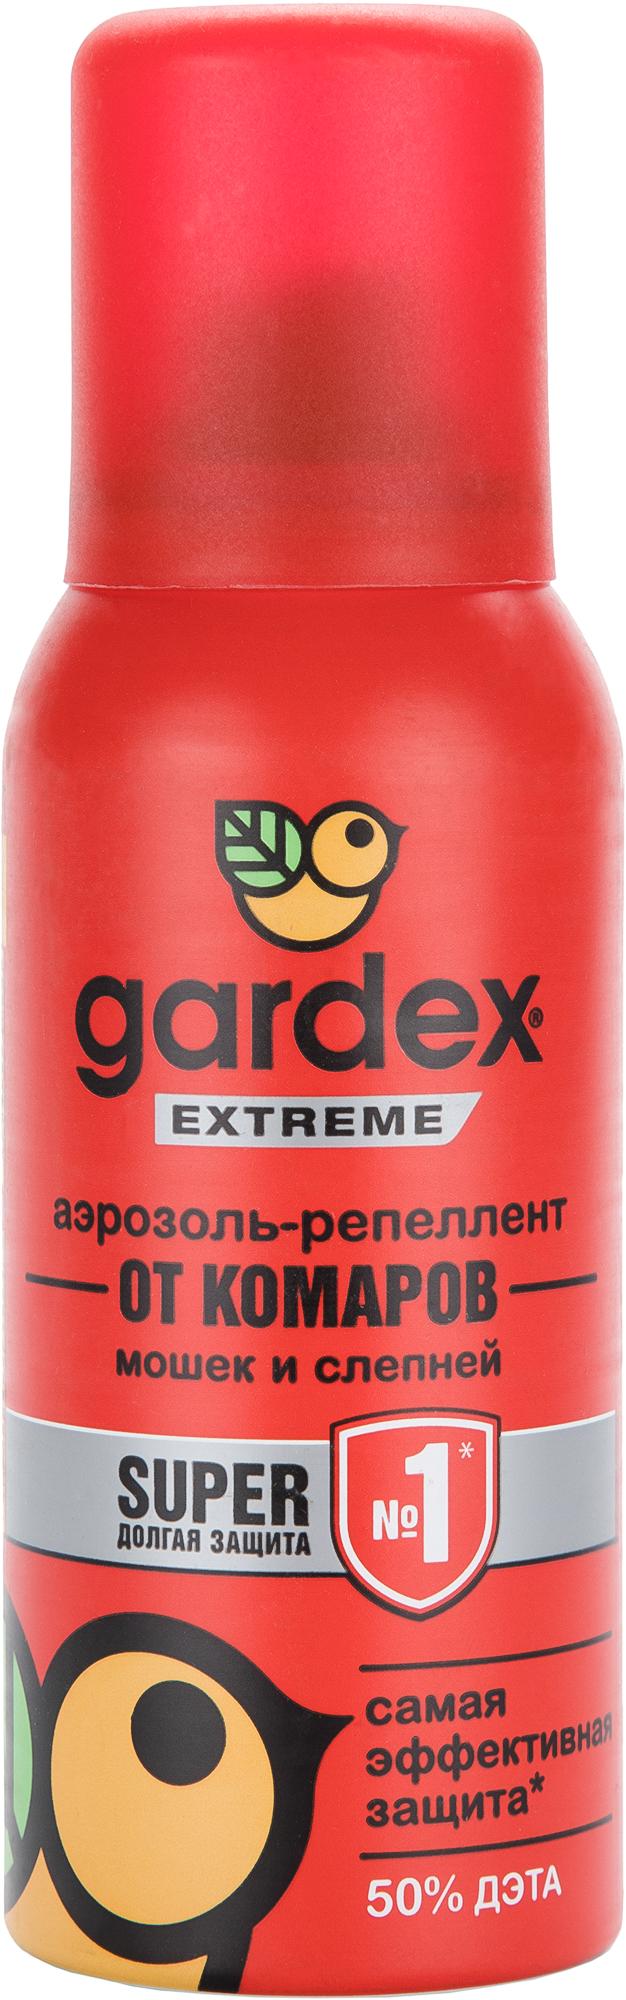 Gardex Аэрозоль-репеллент Gardex Extreme свеча от комаров argus